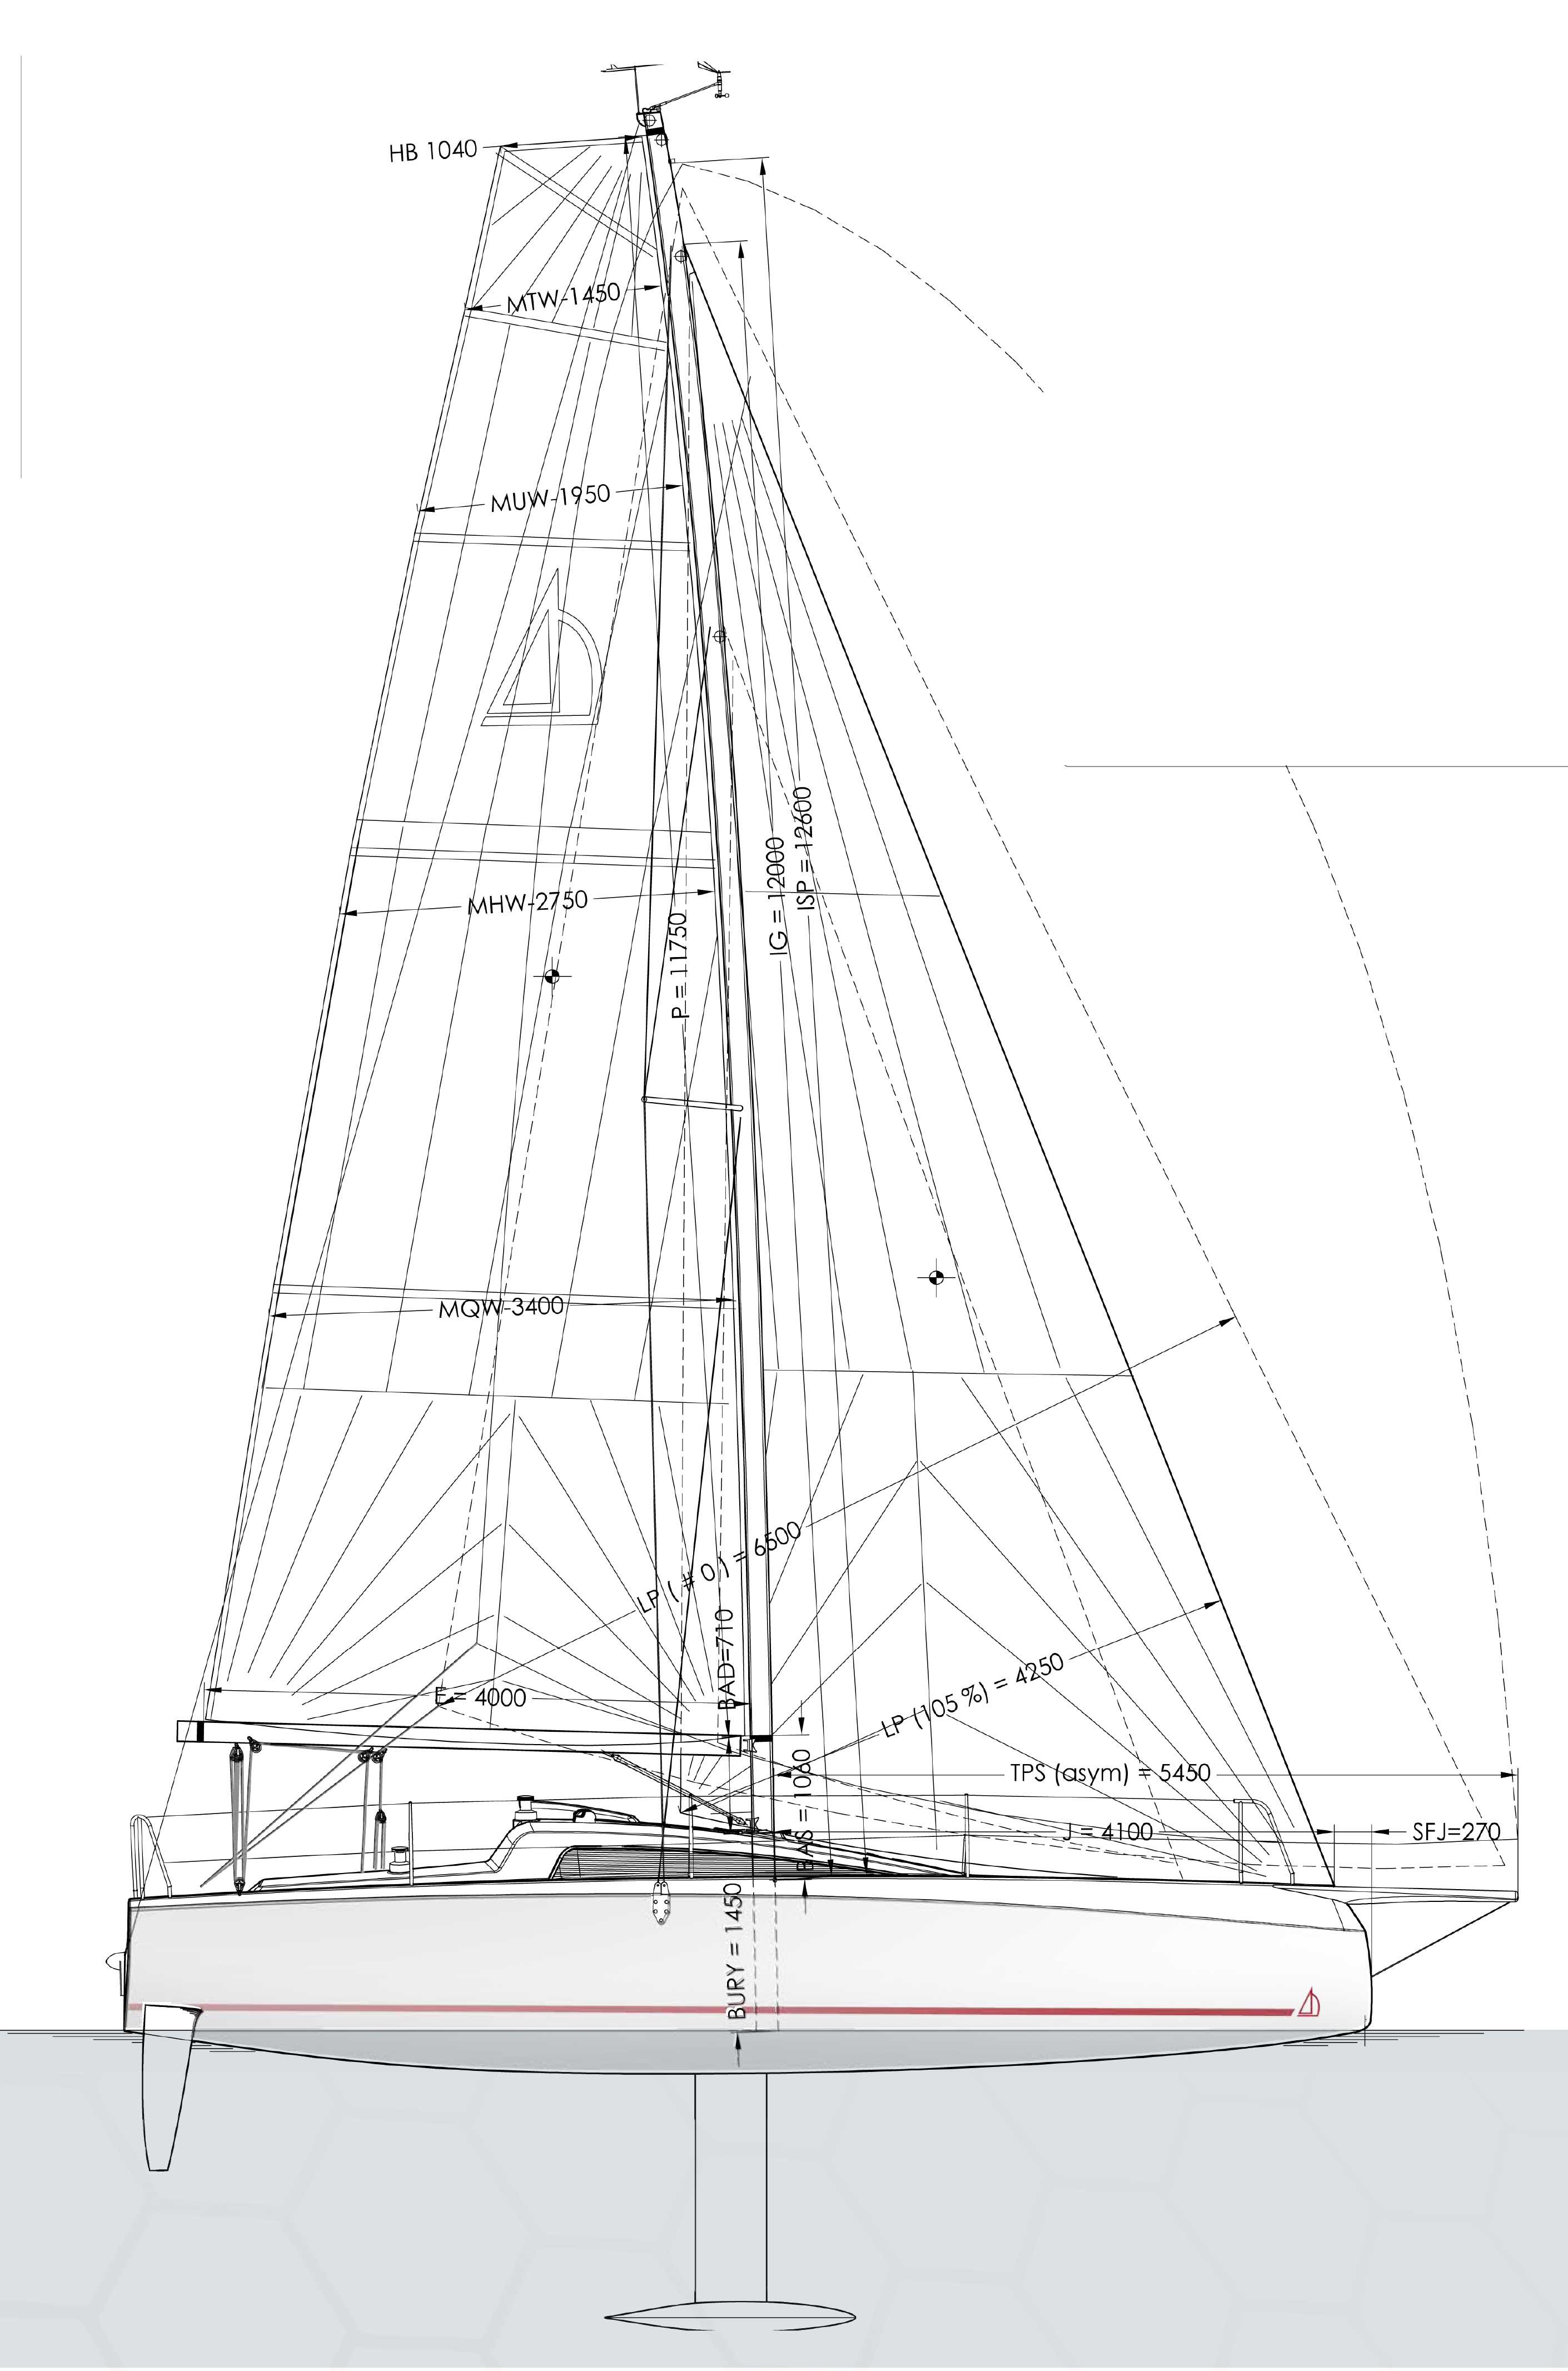 Dehler-30-od-sailplan.jpg